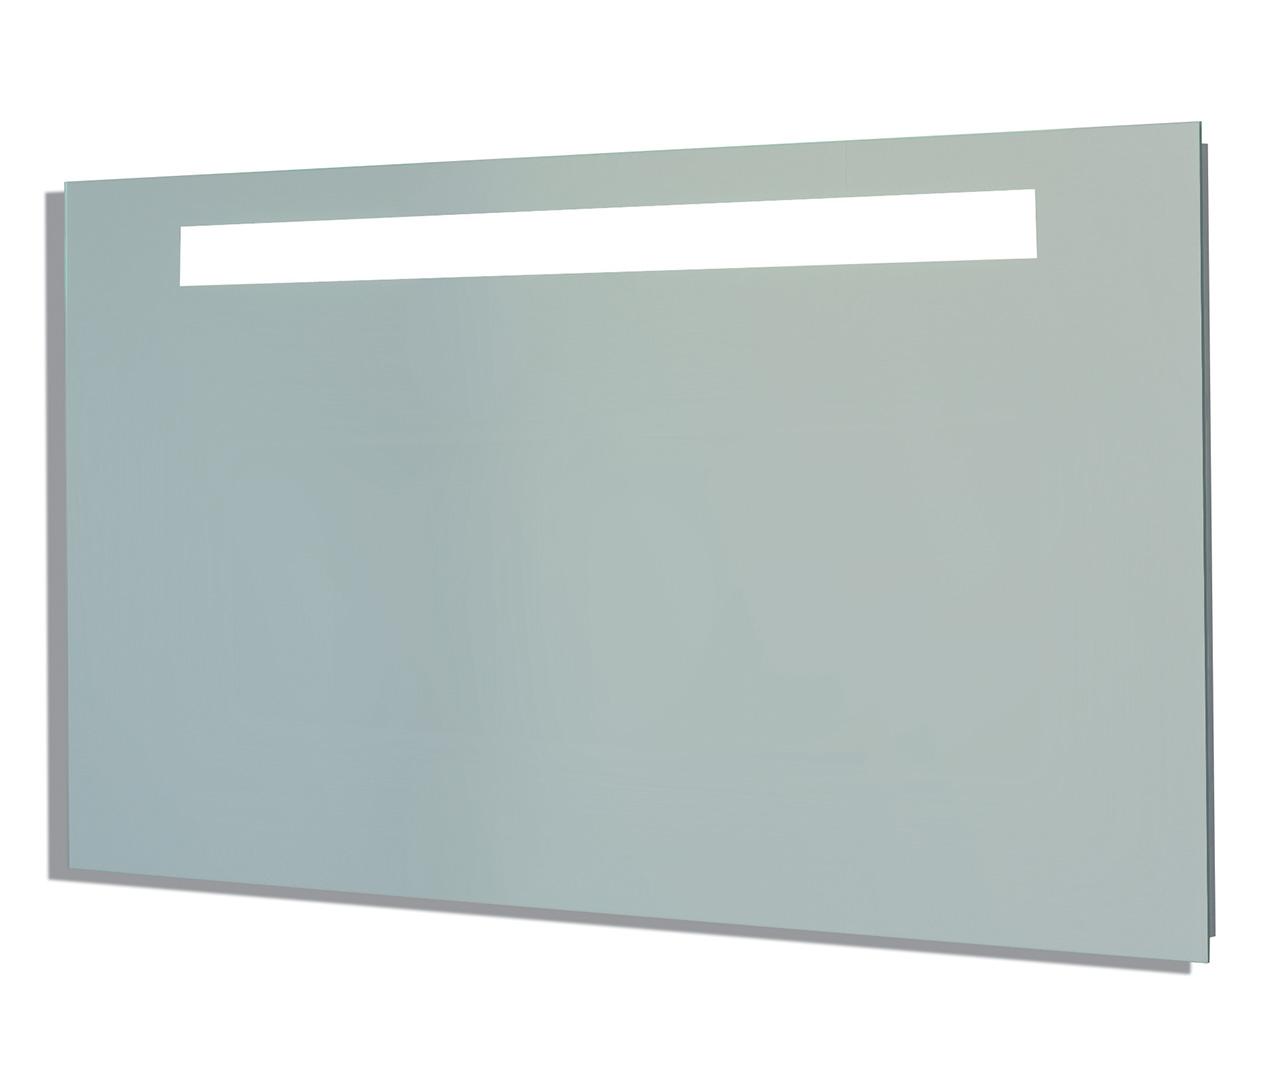 Gamma reflet spiegels badkamerspiegel sanijura for Miroir sanijura reflet